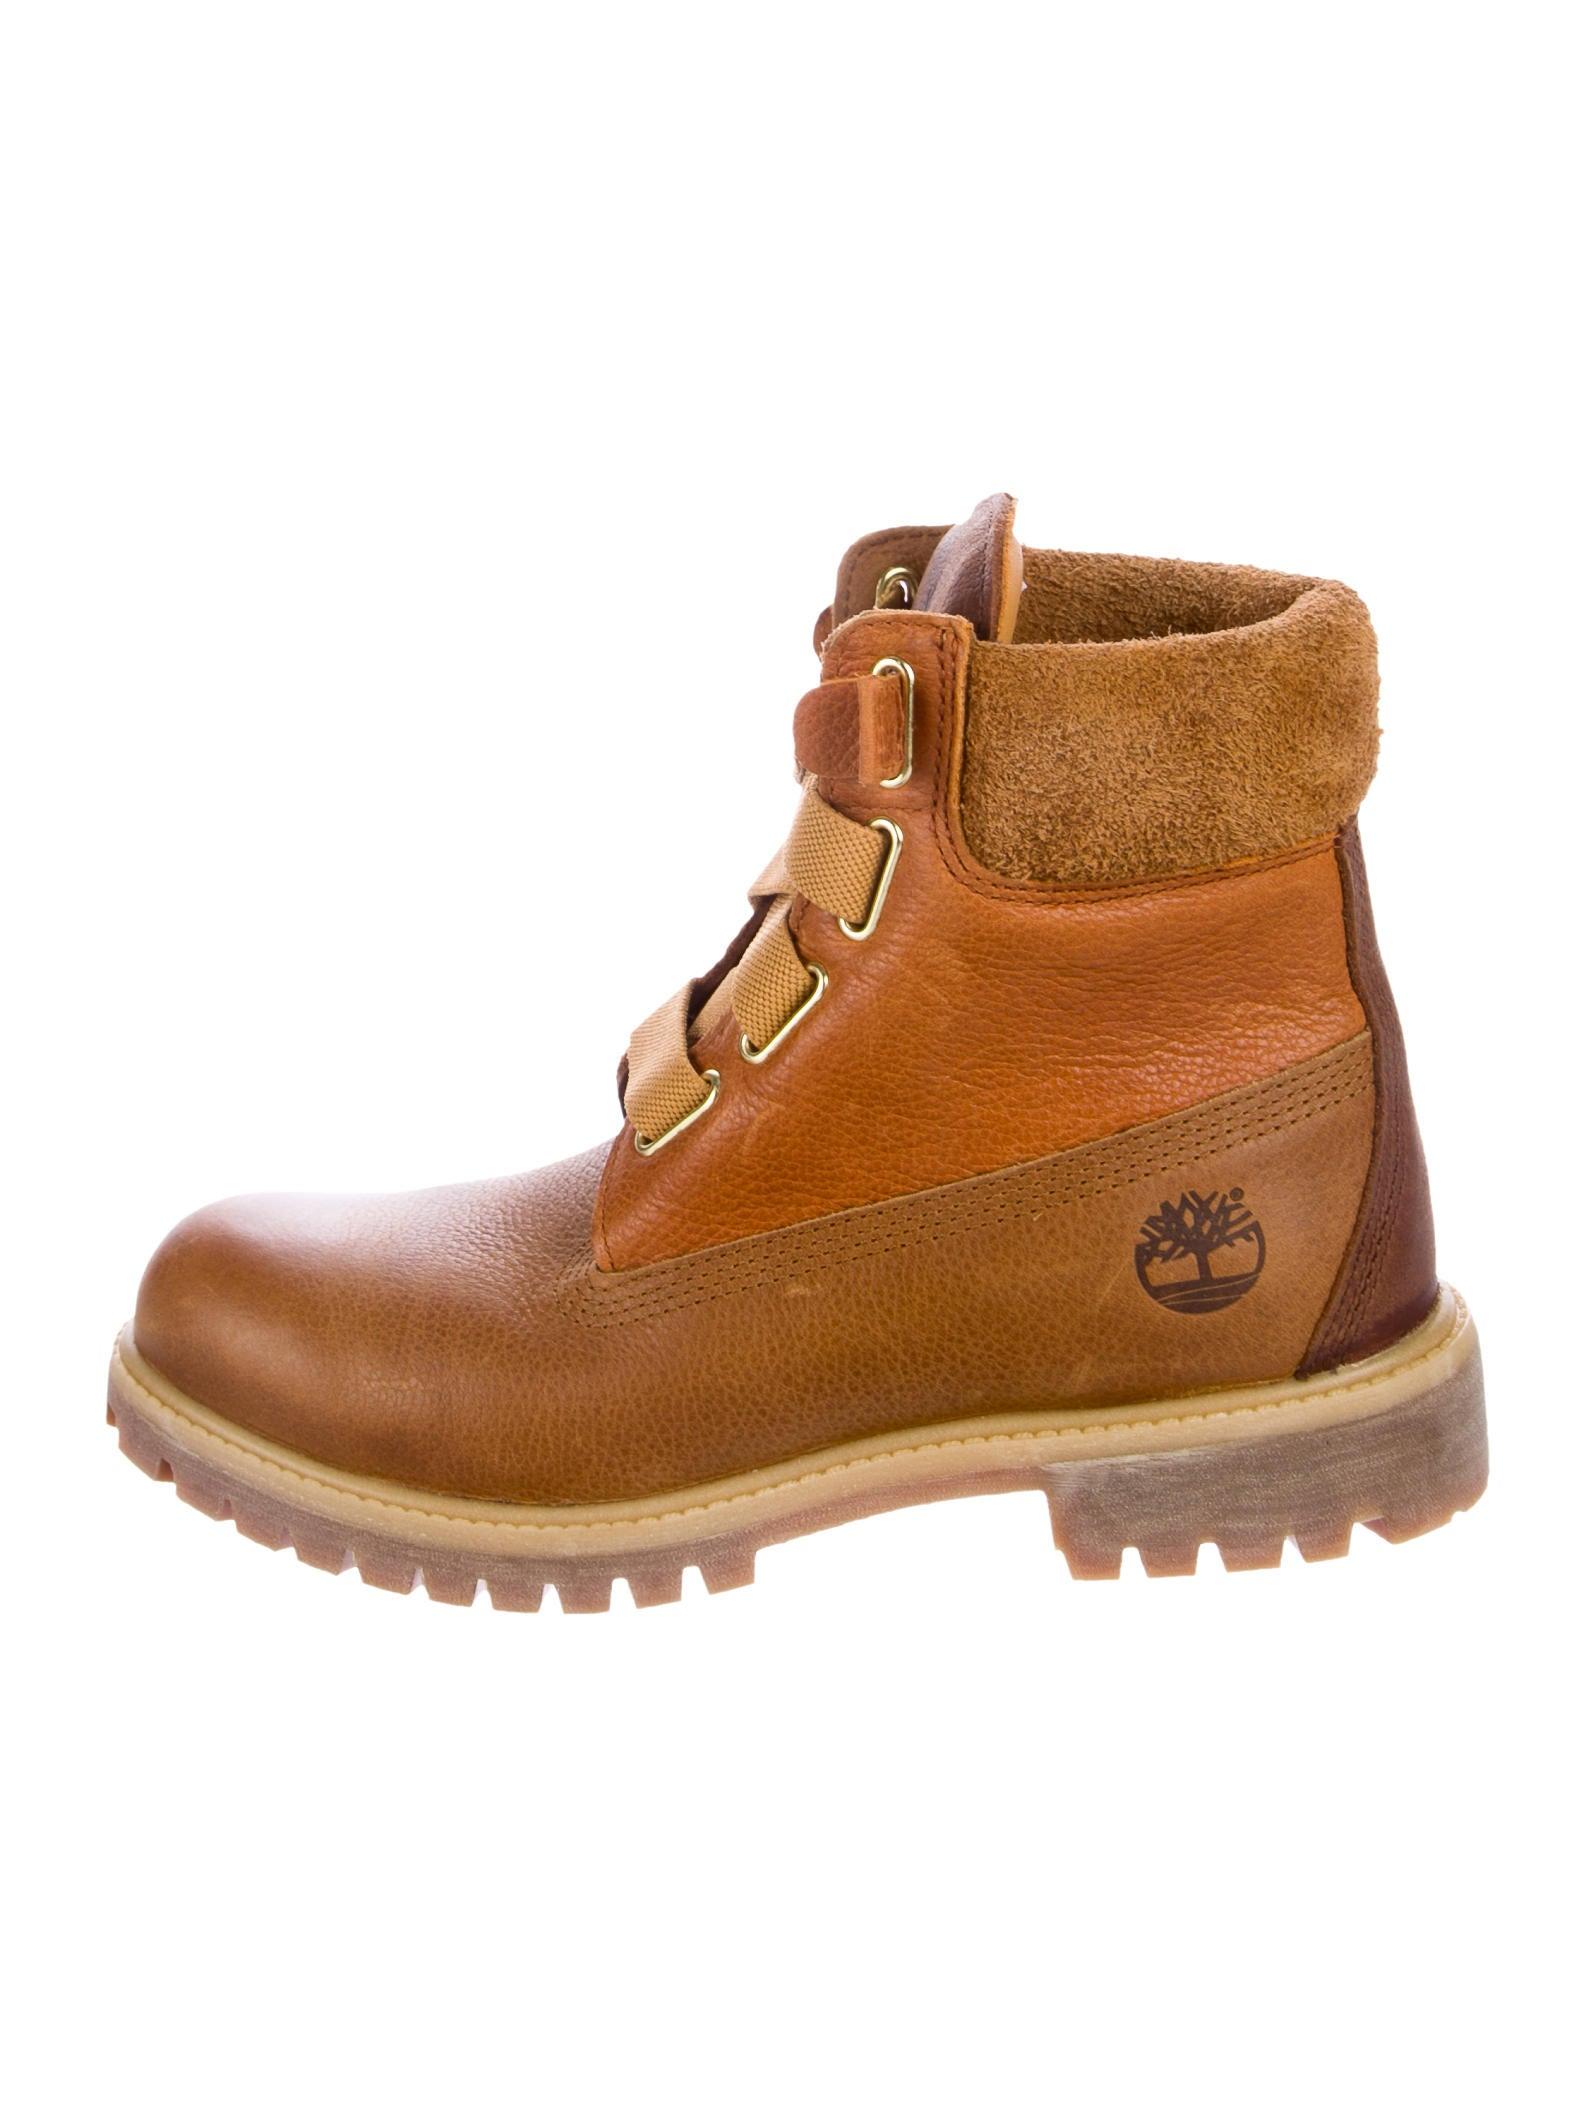 x Timberland 2016 Convenience Boots